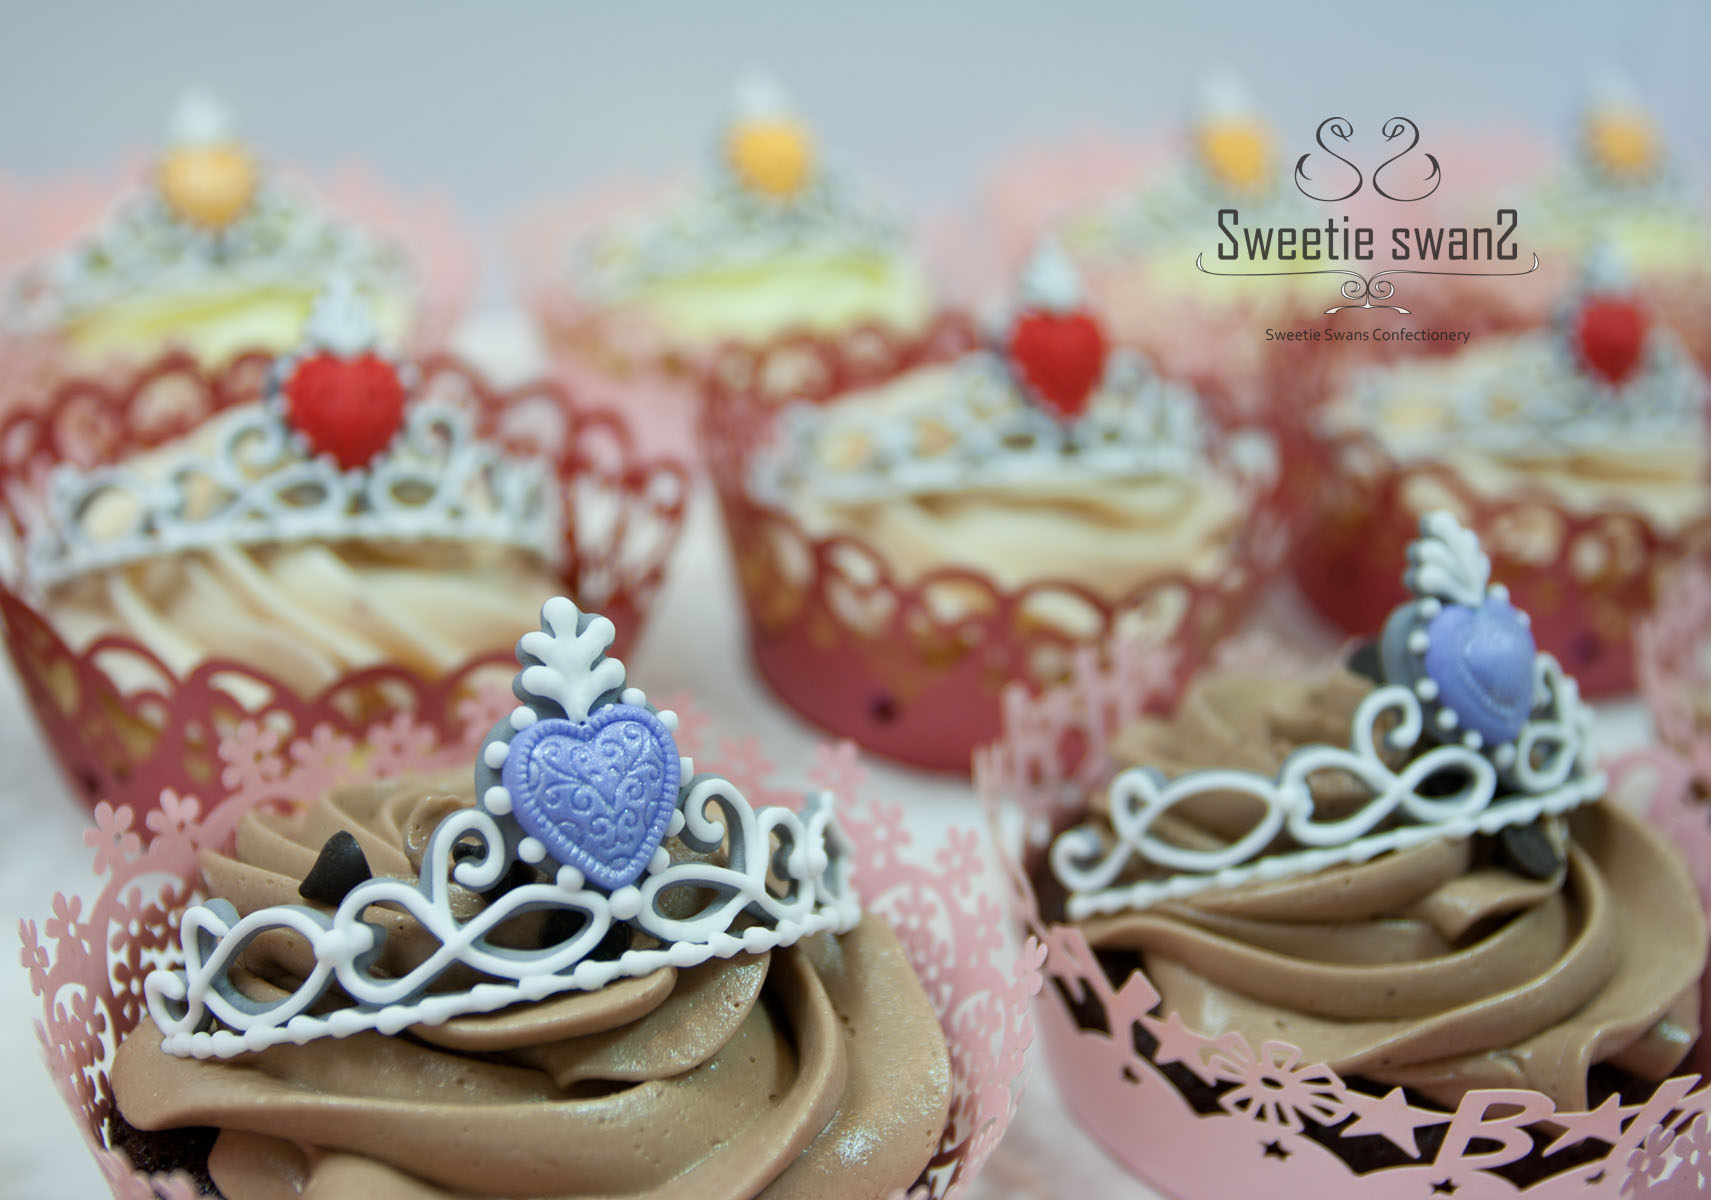 Icing tiara cupcake-2 small